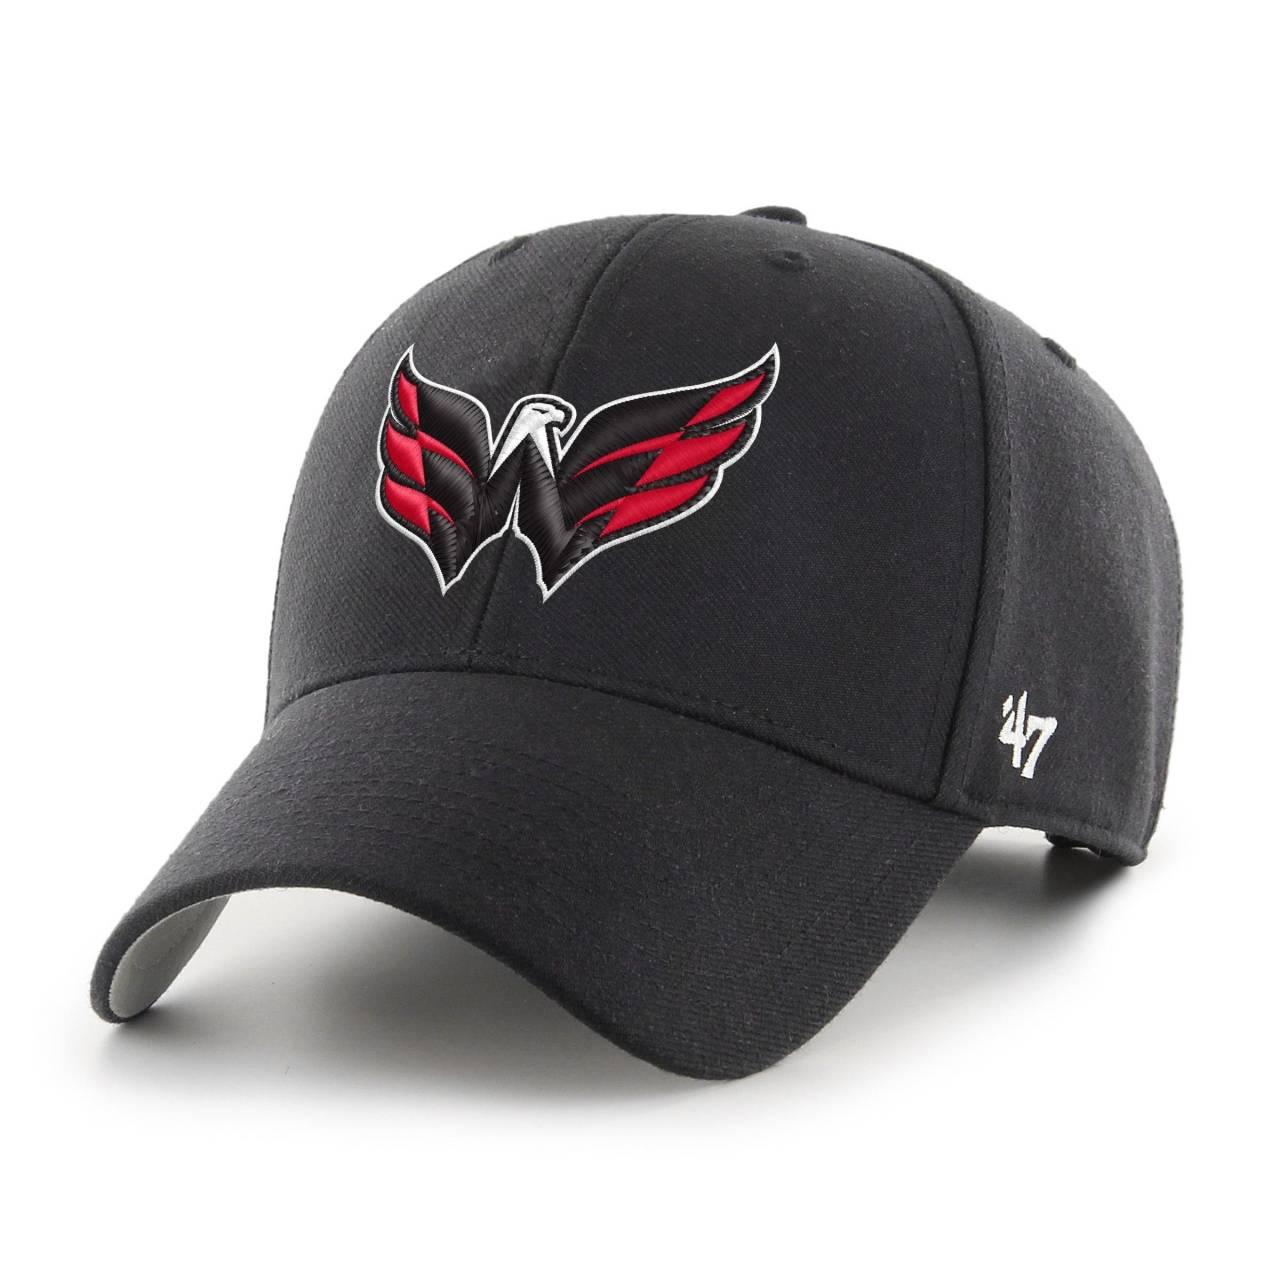 NHL WASHINGTON CAPITALS '47 MVP BLACK CAP